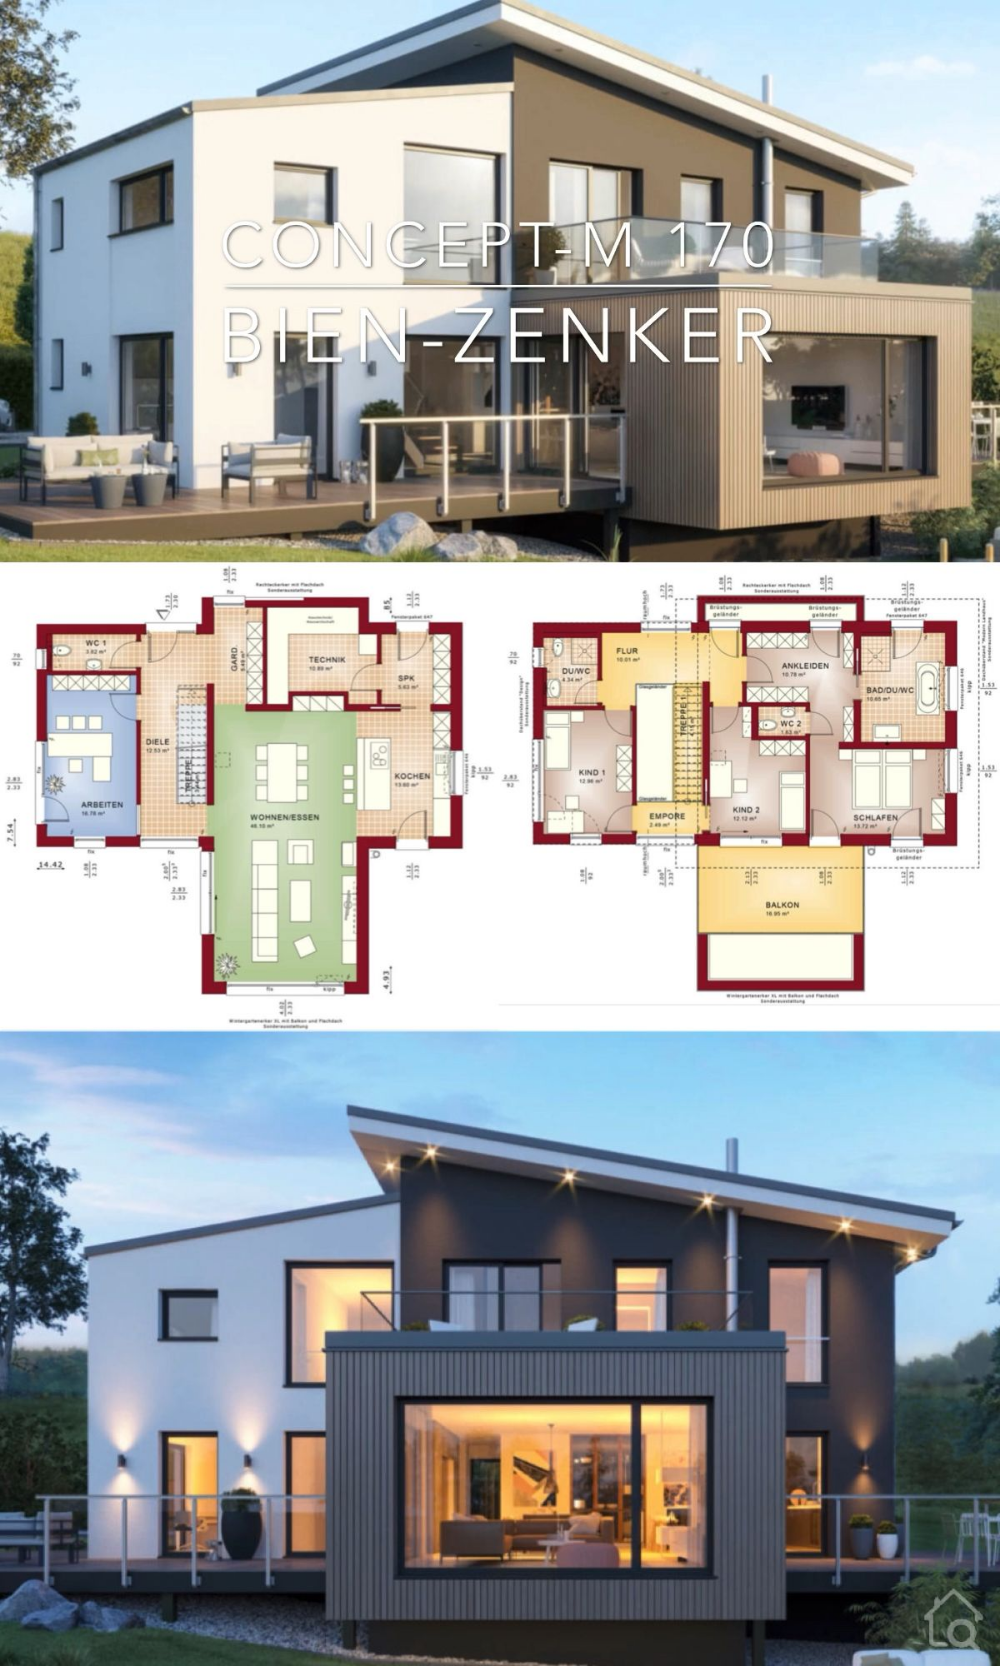 Modern Villa Architecture Home Plan Interior Design Conceptm 170 Modern Contemporary Villa Architecture House Plan Concept M 170 European Dream Home Ideas Wi Arhitektura Poetazhnye Plany Domov Chertezhi Doma